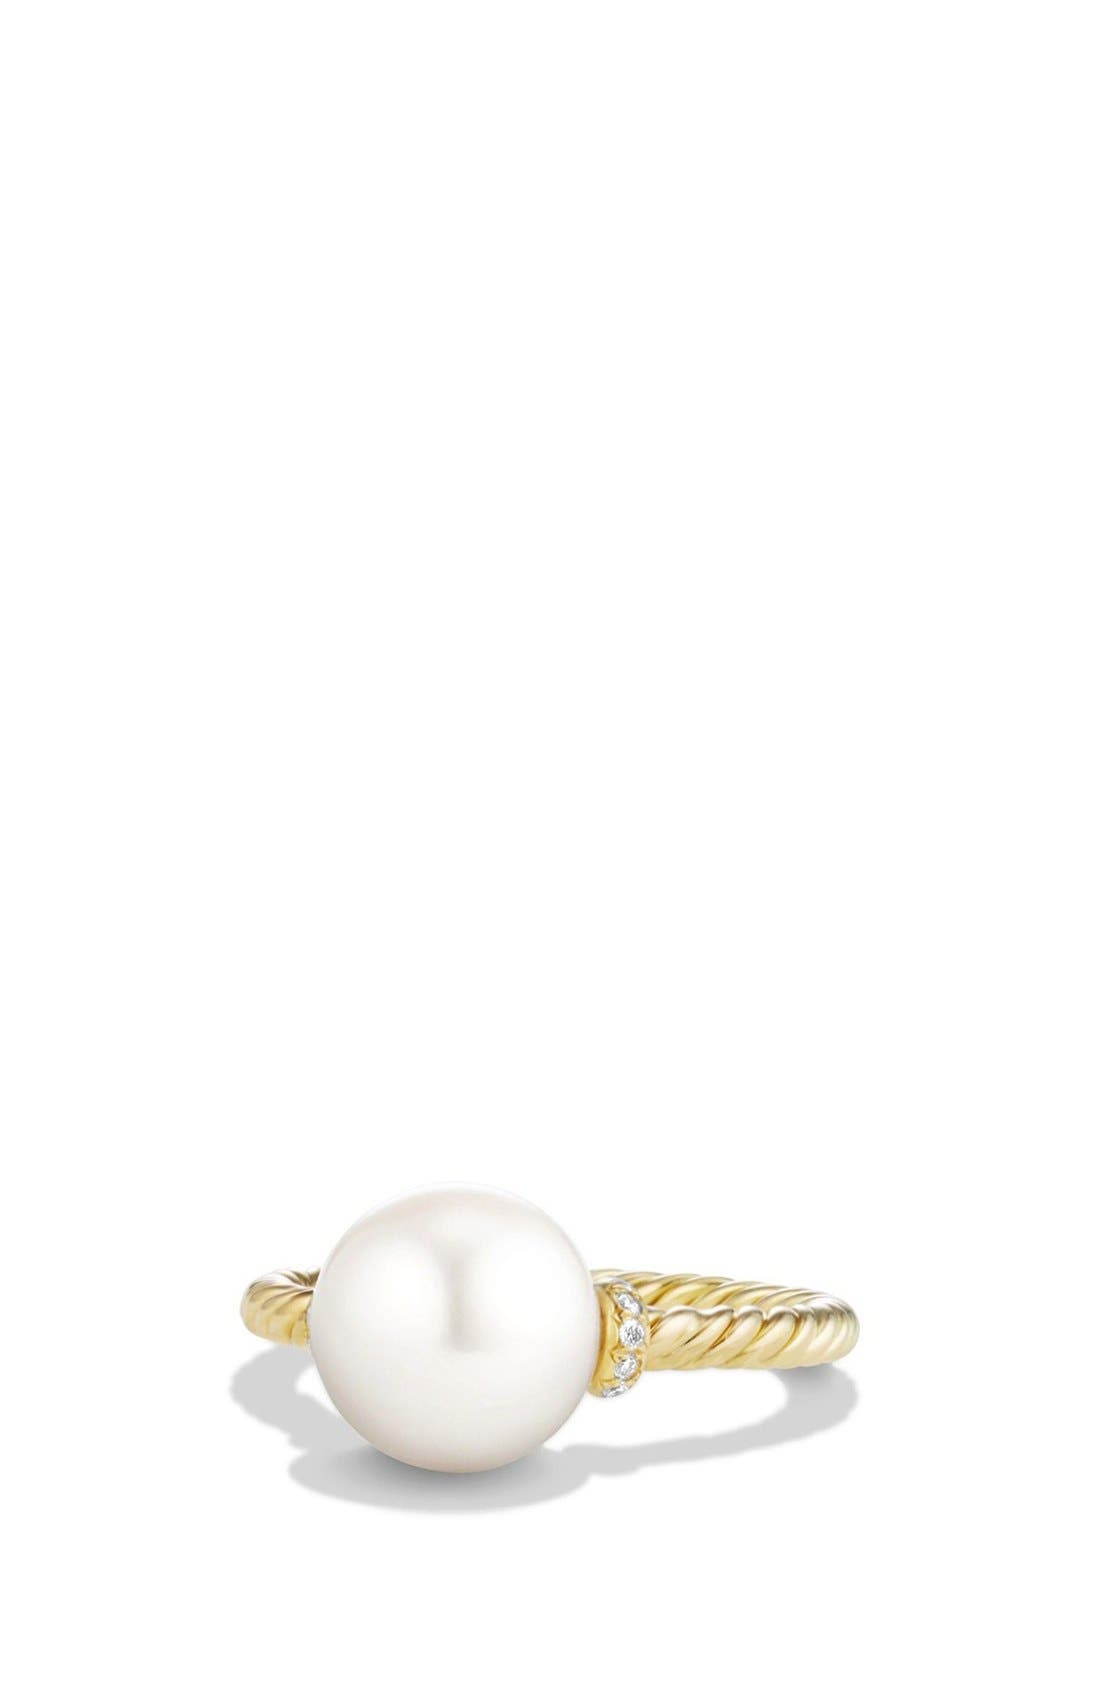 David Yurman 'Solari' Station Ring with Diamonds and Pearls